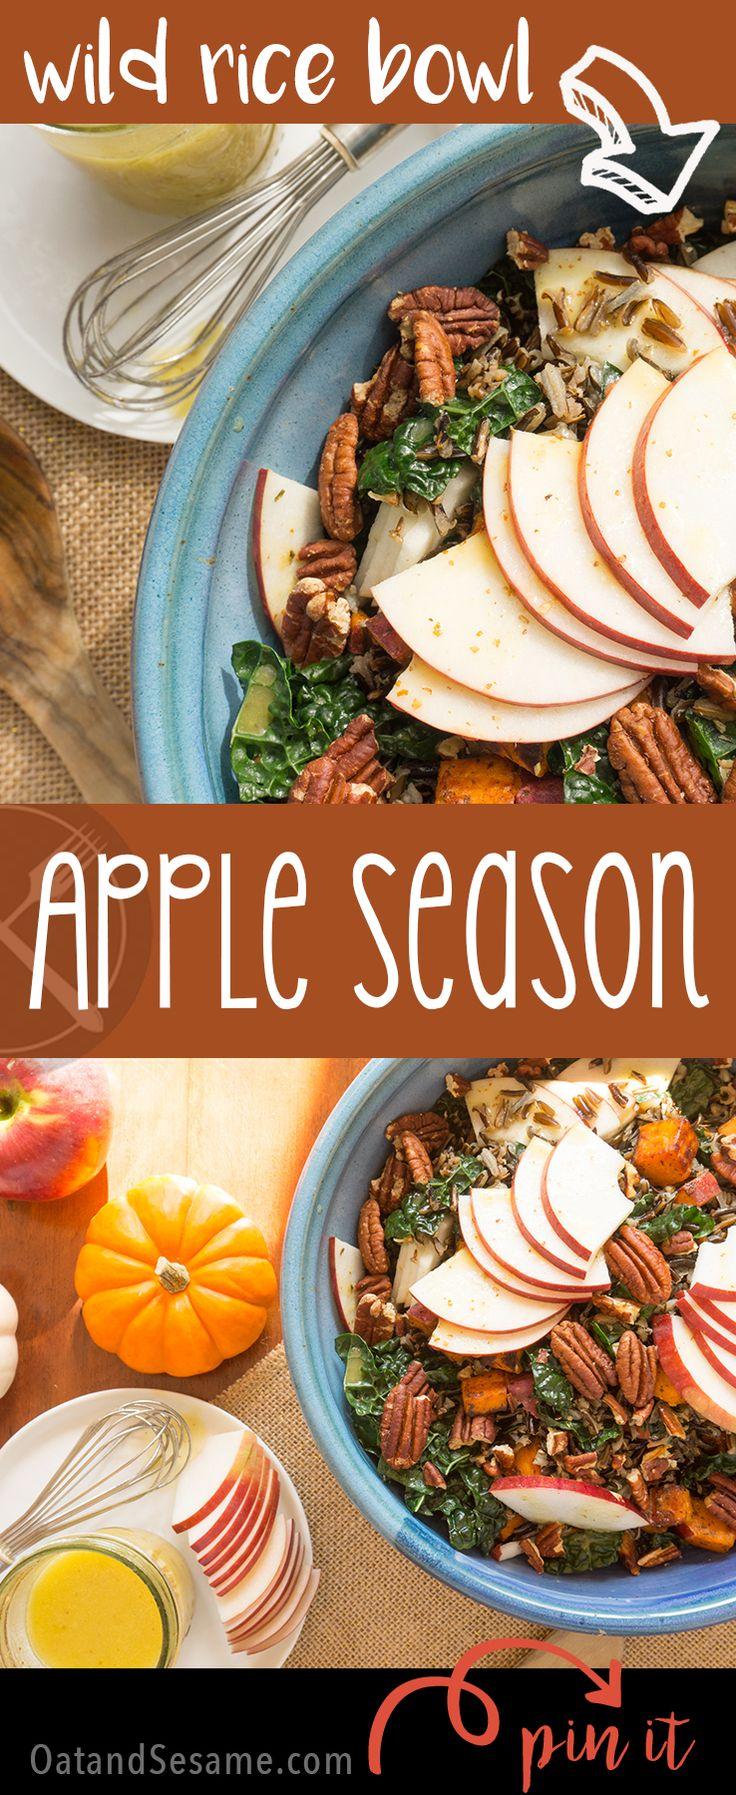 Wild Rice with Apples, Kale and Cider Vinaigrette | Recipe at OatandSesame.com